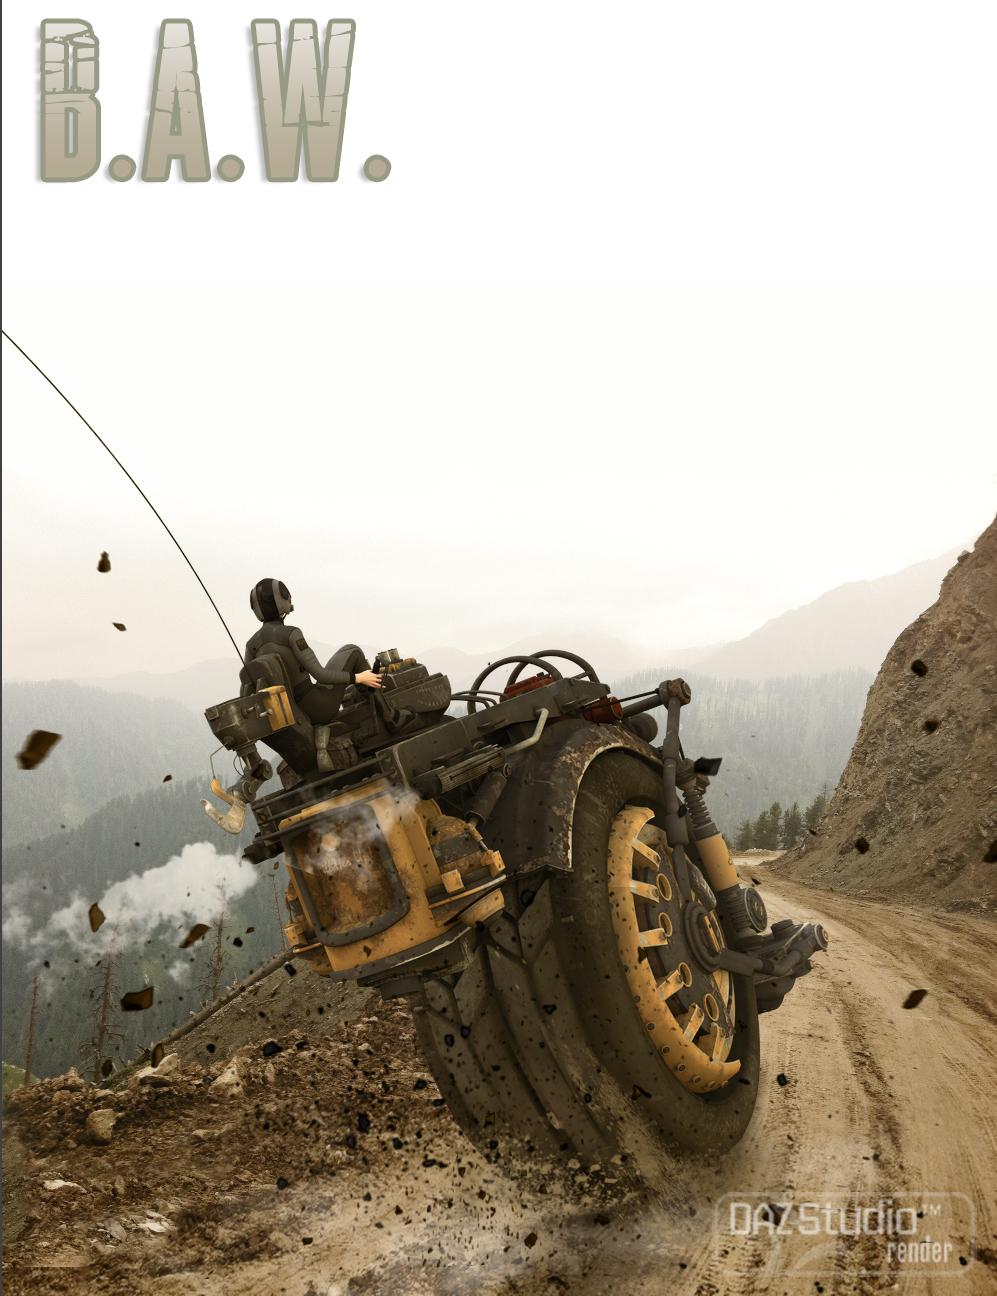 B.A.W. by: The AntFarm, 3D Models by Daz 3D